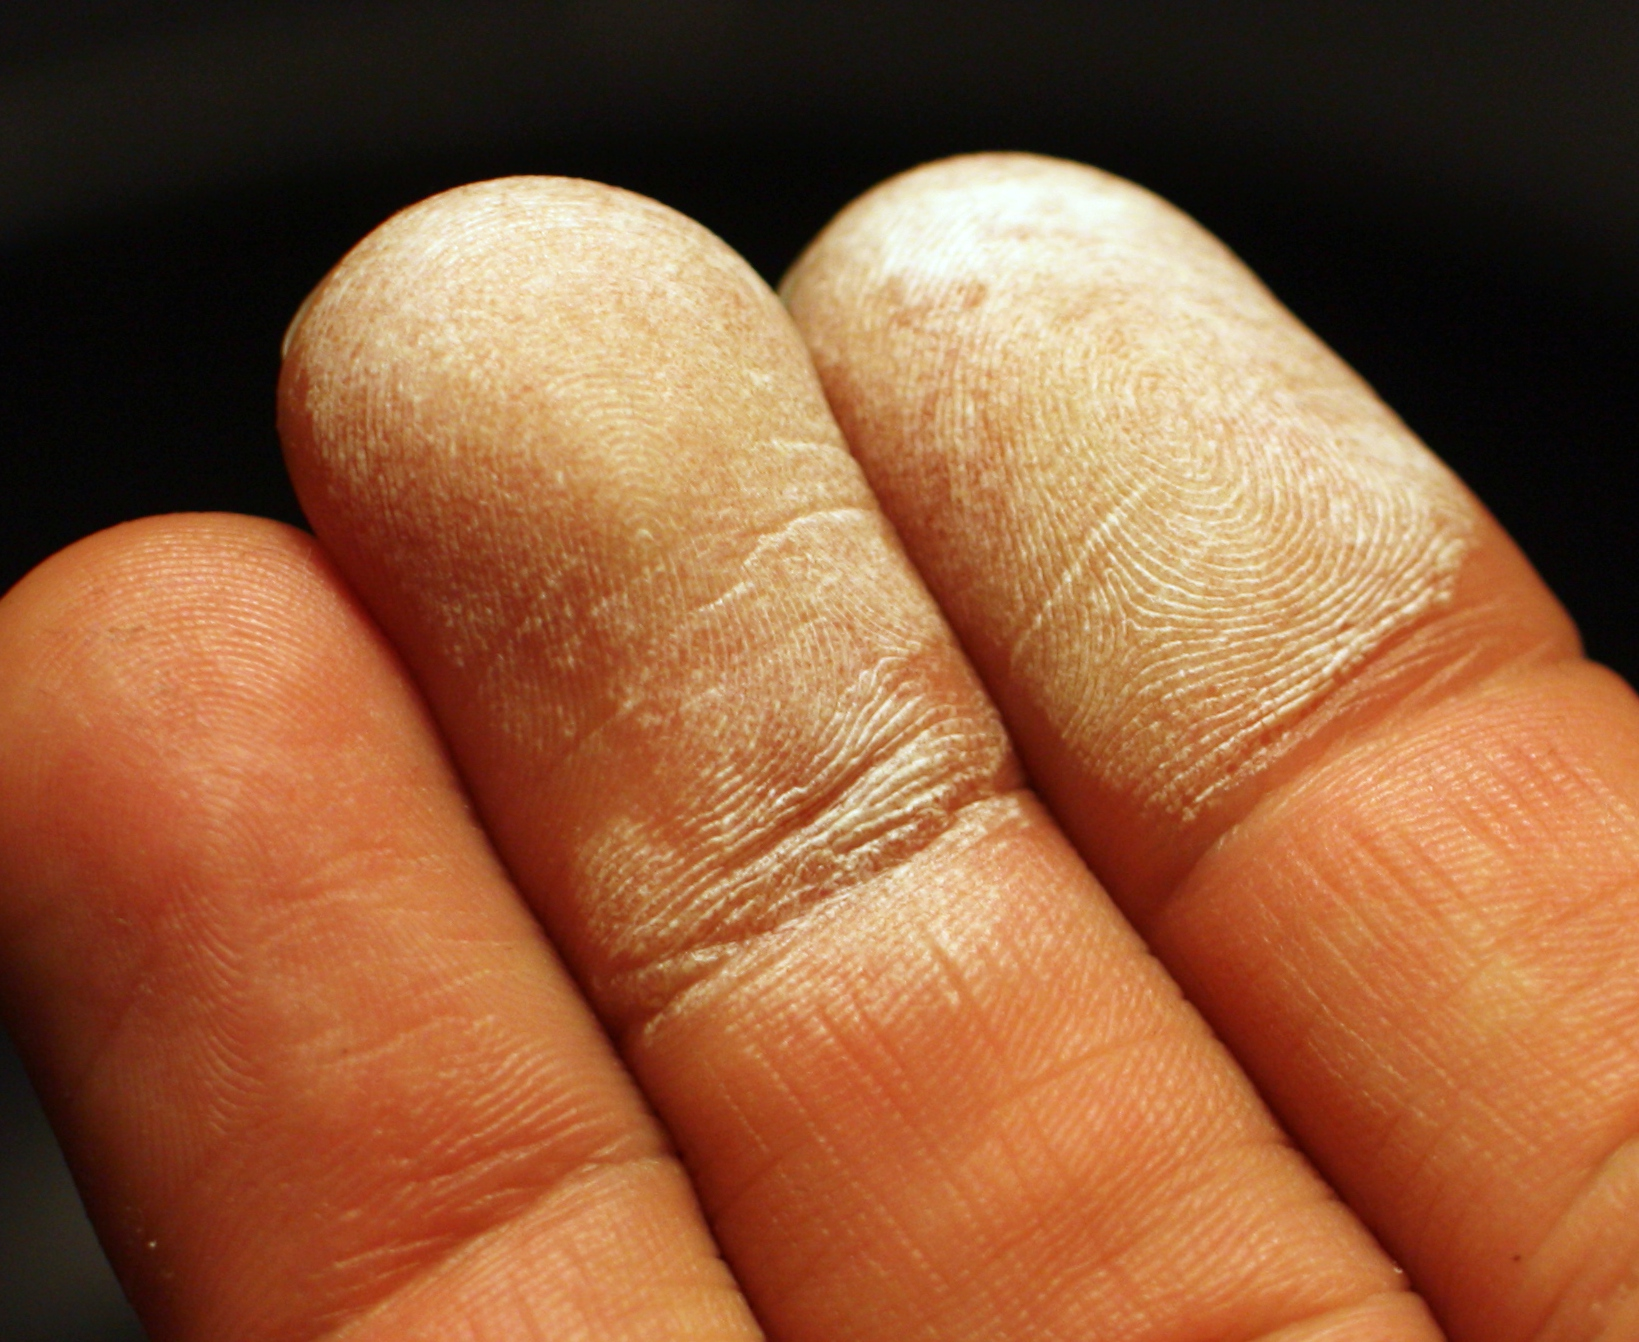 peroxide on skin